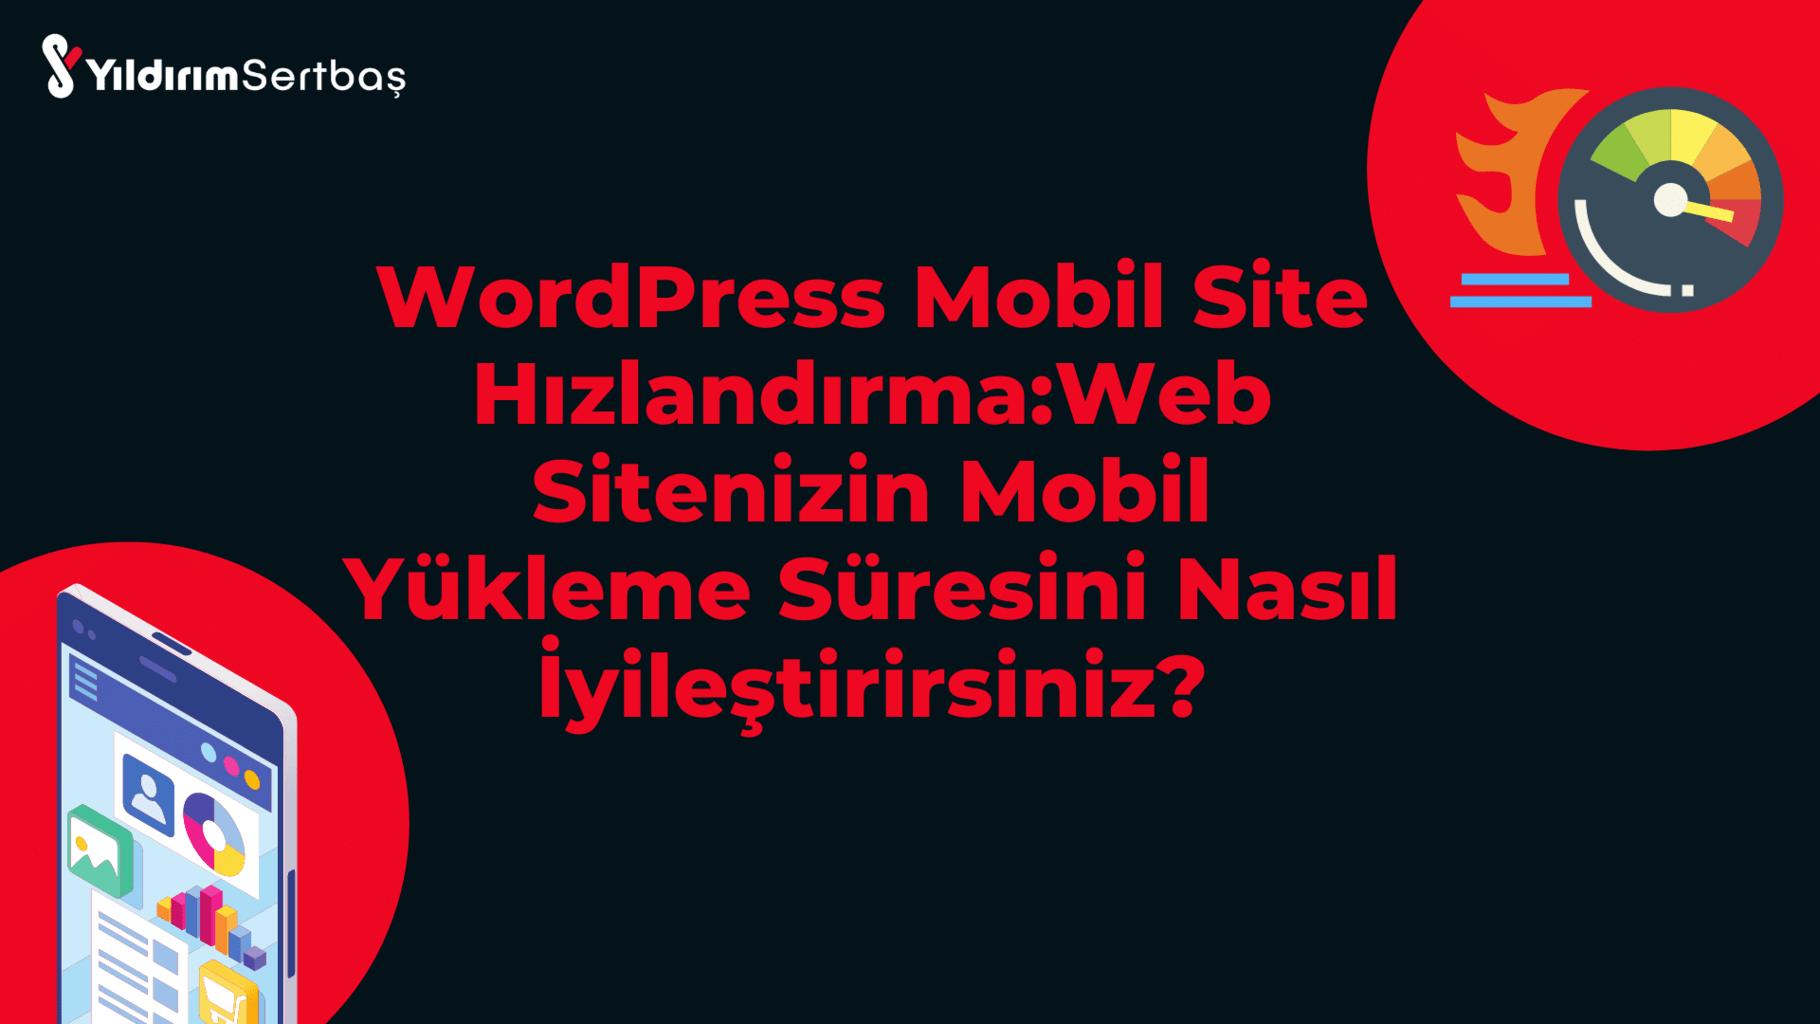 WordPress Mobil Site Hızlandırma